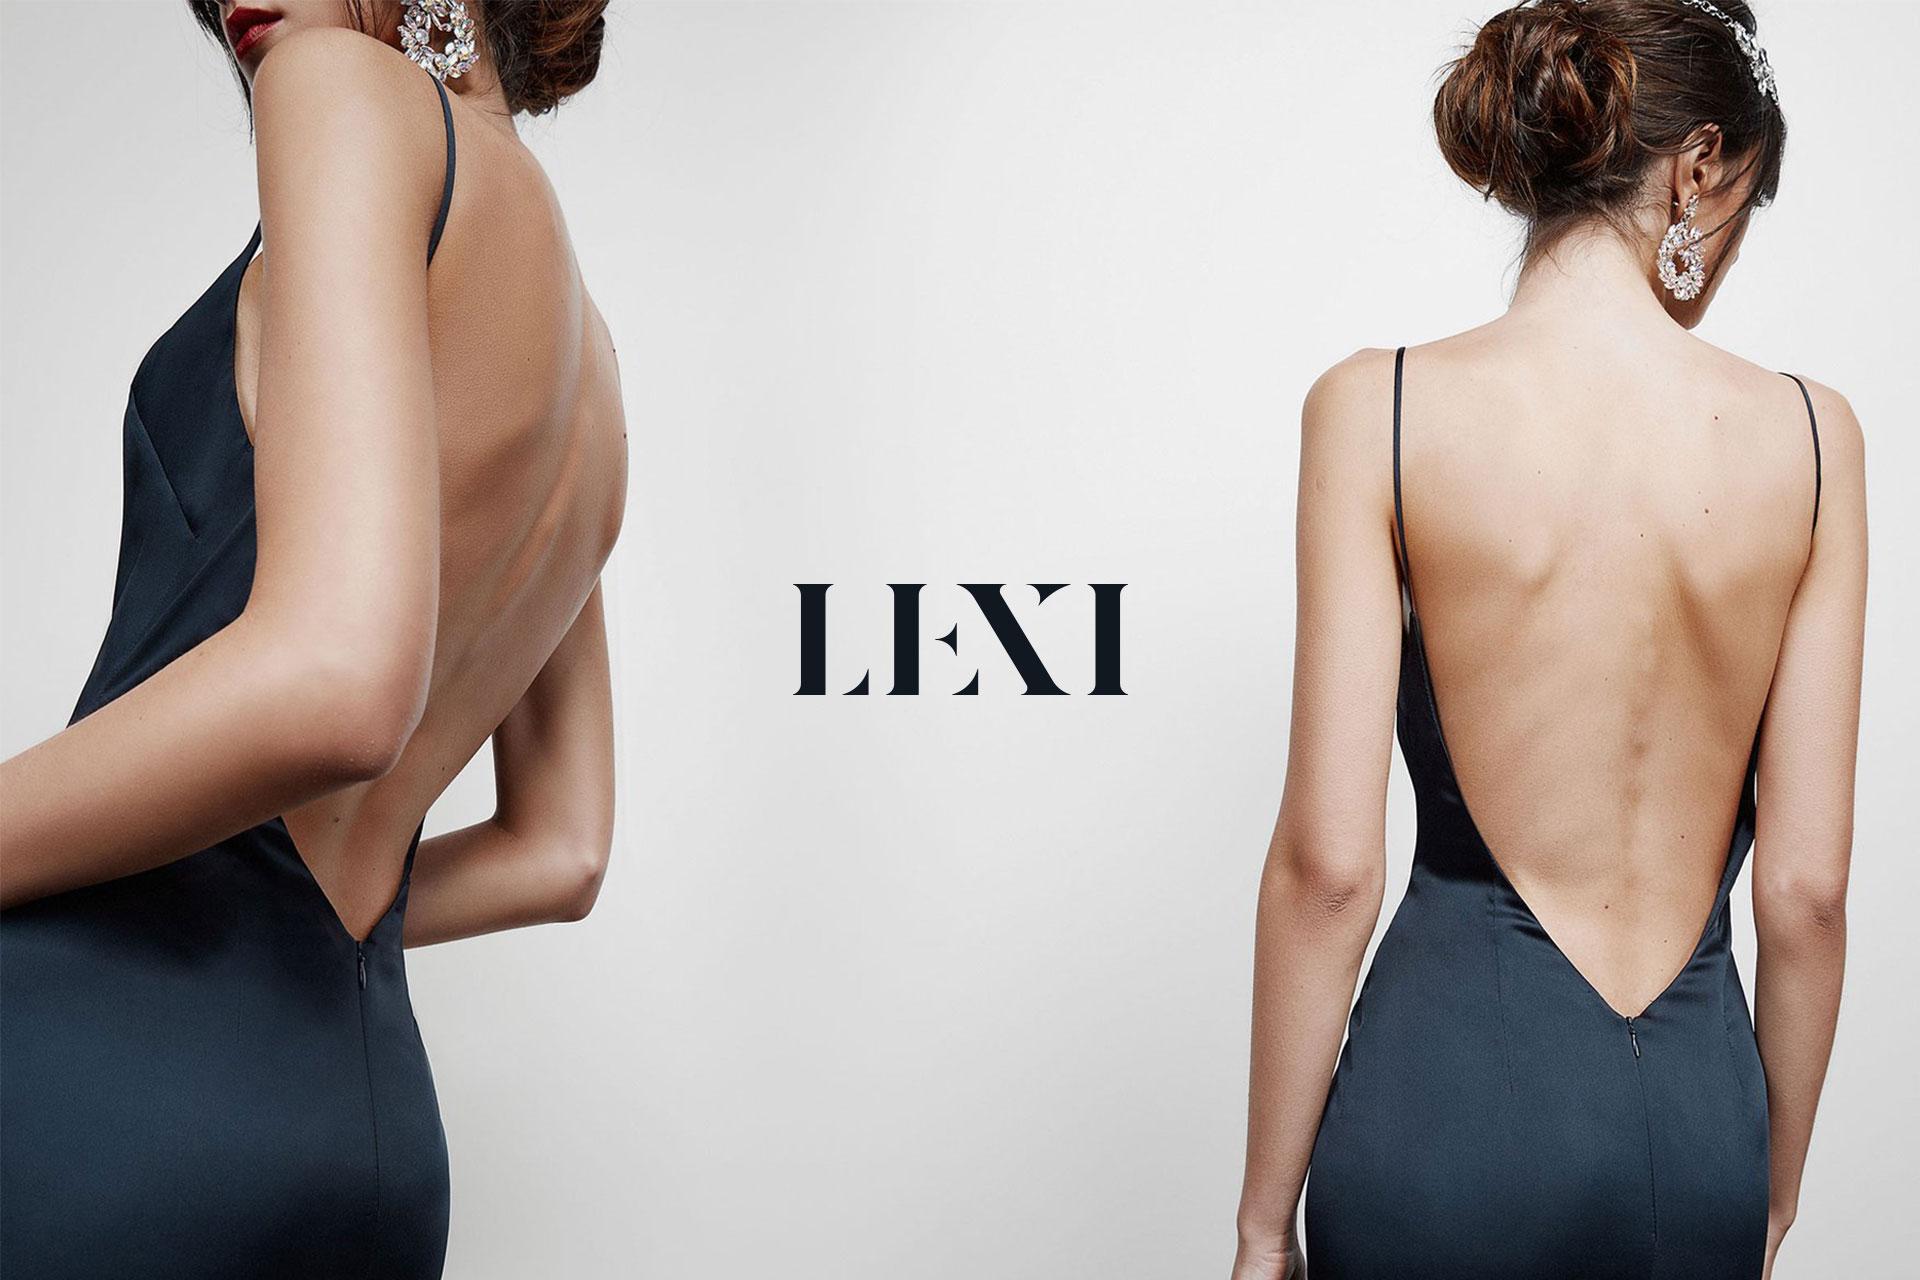 Lexi-Cover